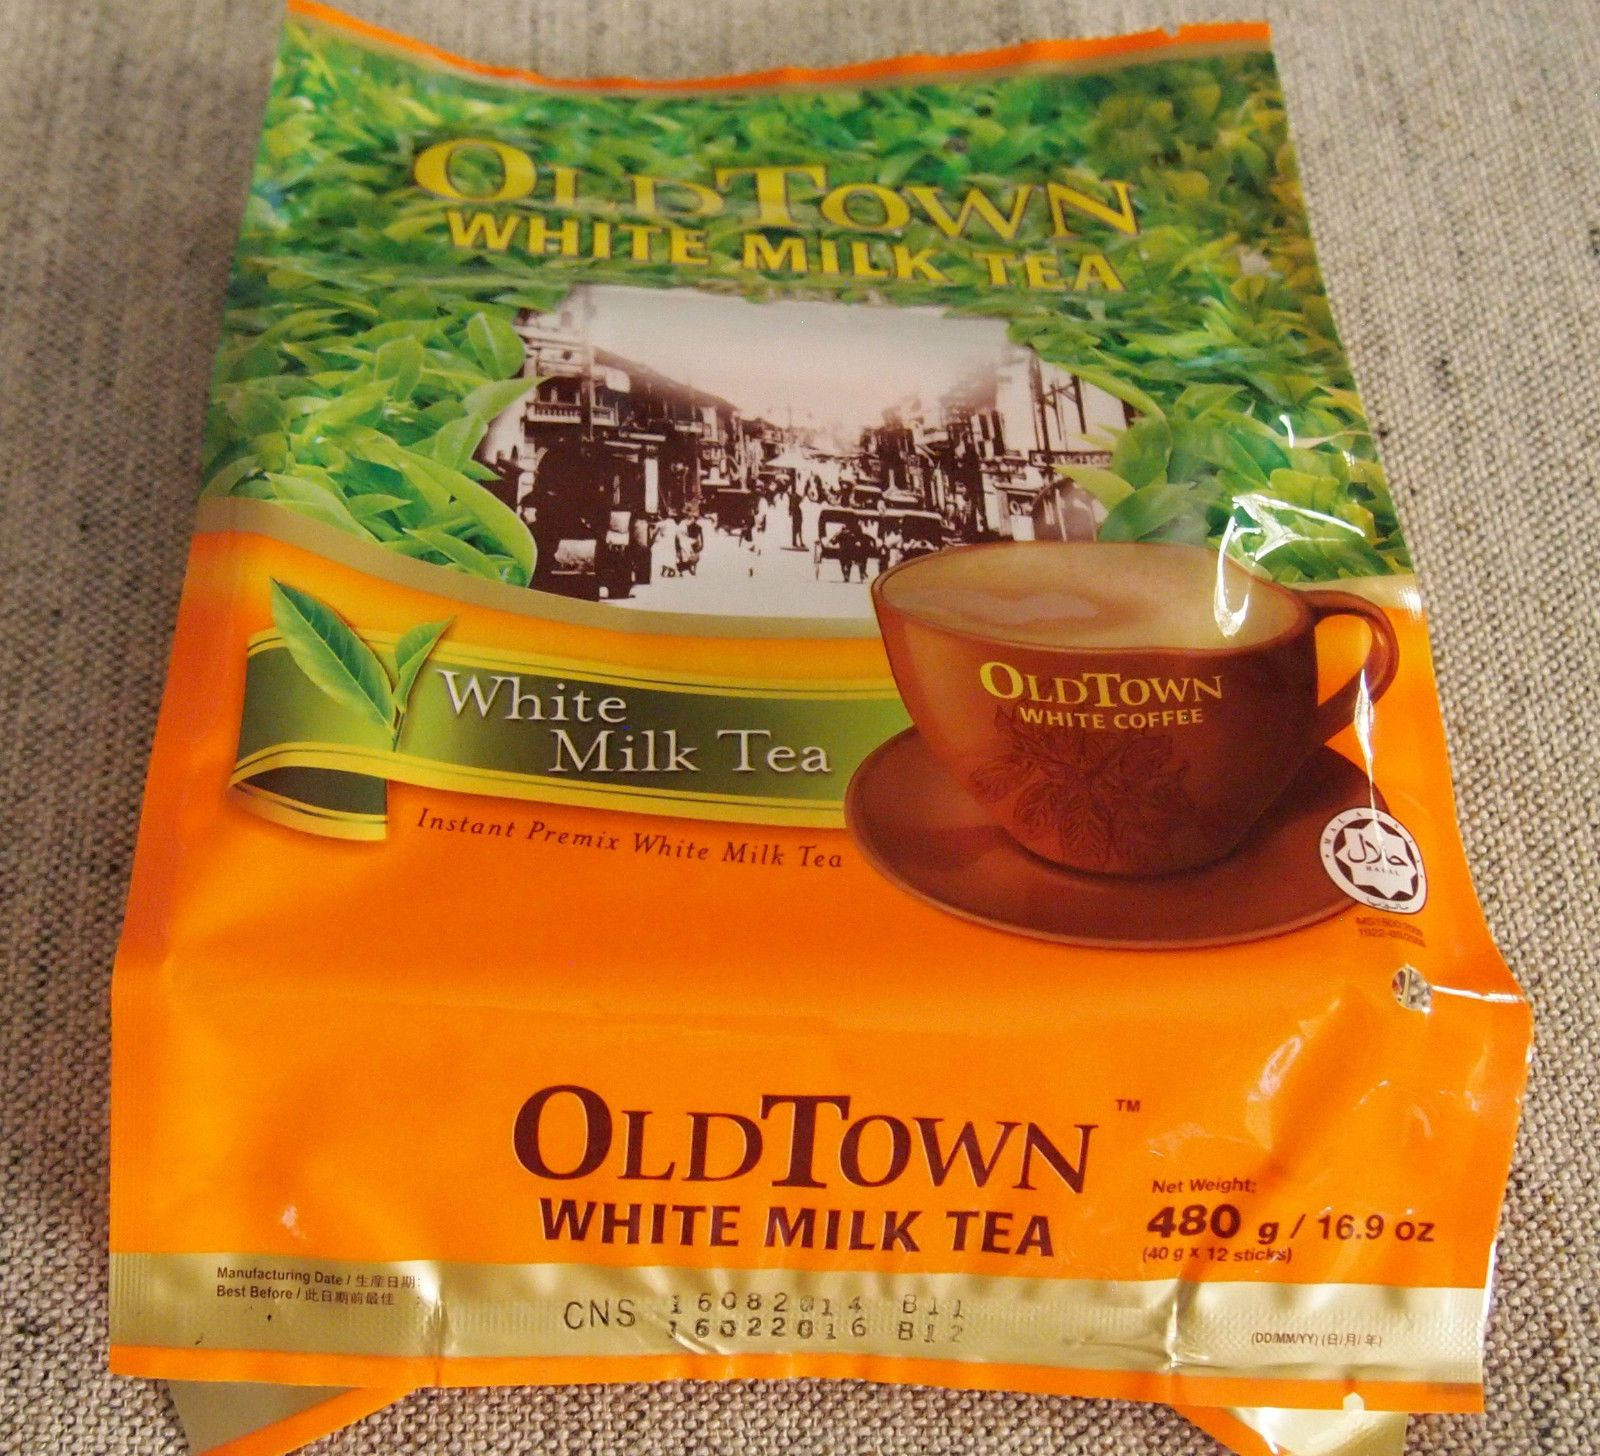 1 Bag Oldtown White Milk Tea 3 In 1 Ipoh, Malaysia 1 Bag